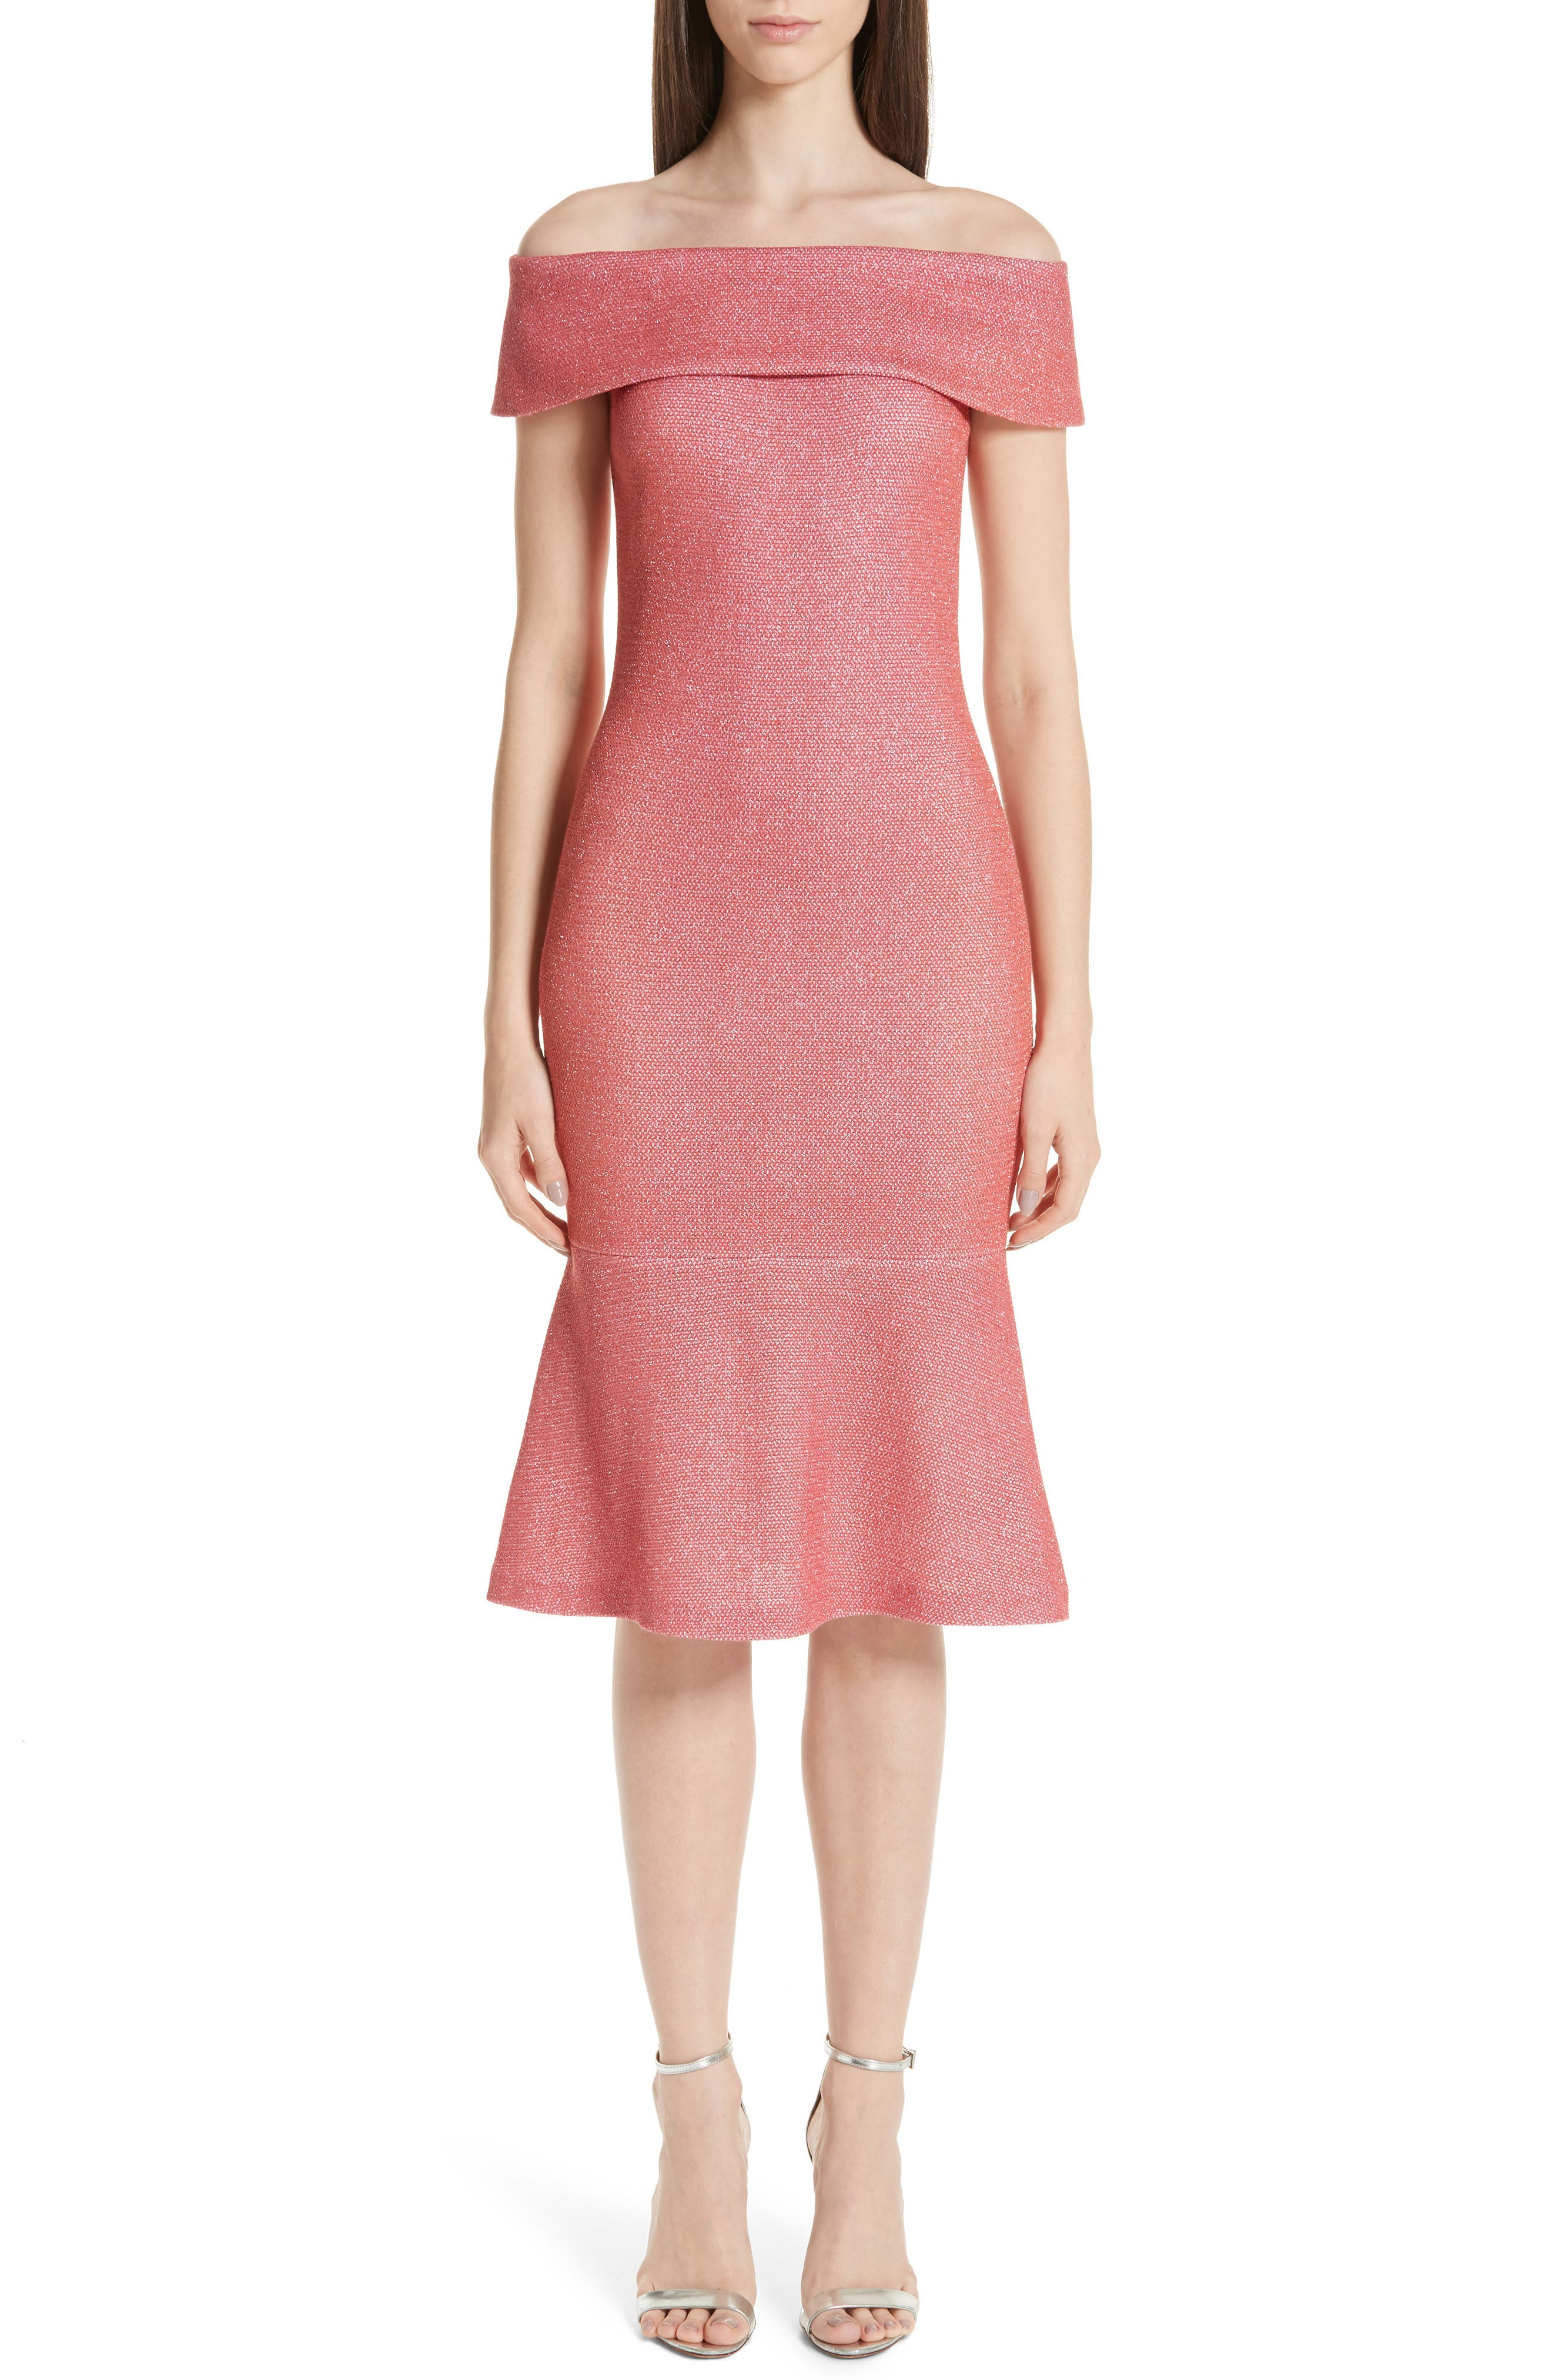 St. John Collection Links Sequin Off The Shoulder Dress, Coral